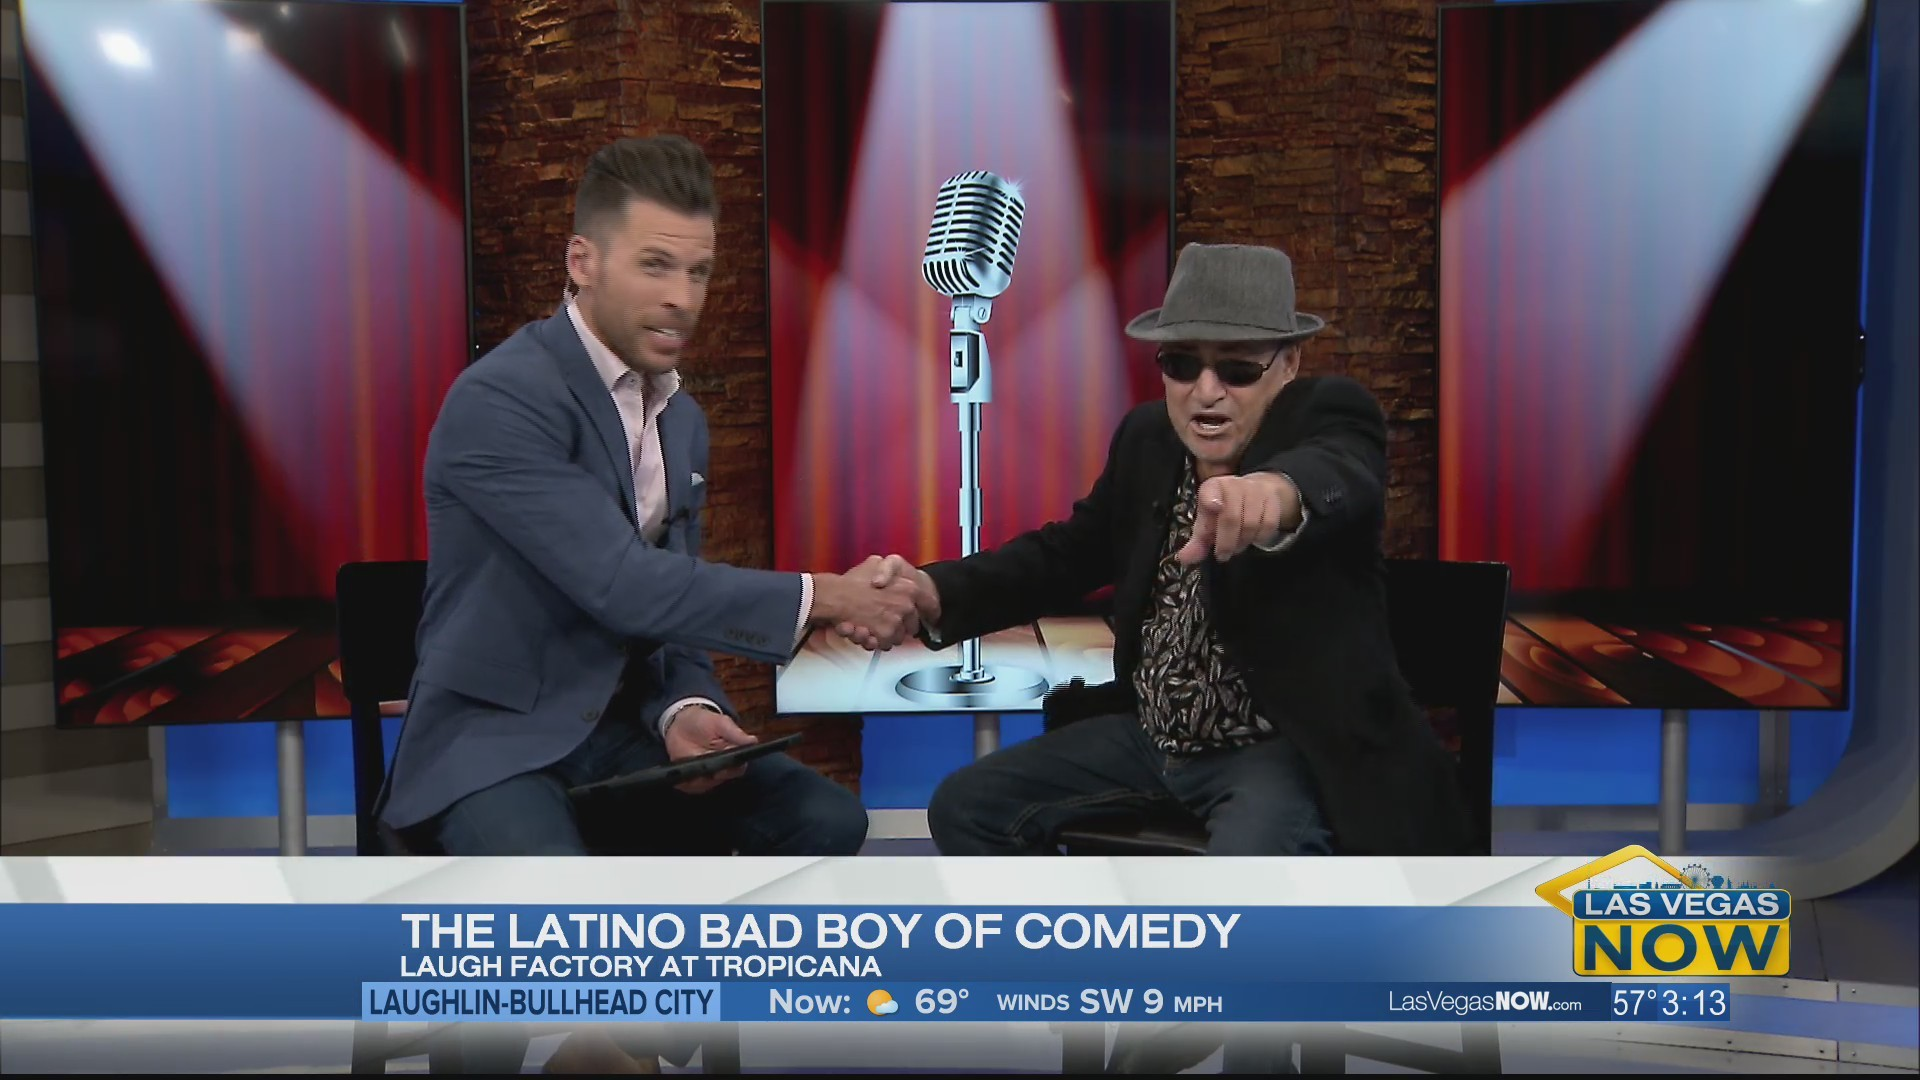 Catch the Latino bad boy of comedy Angel Salazar